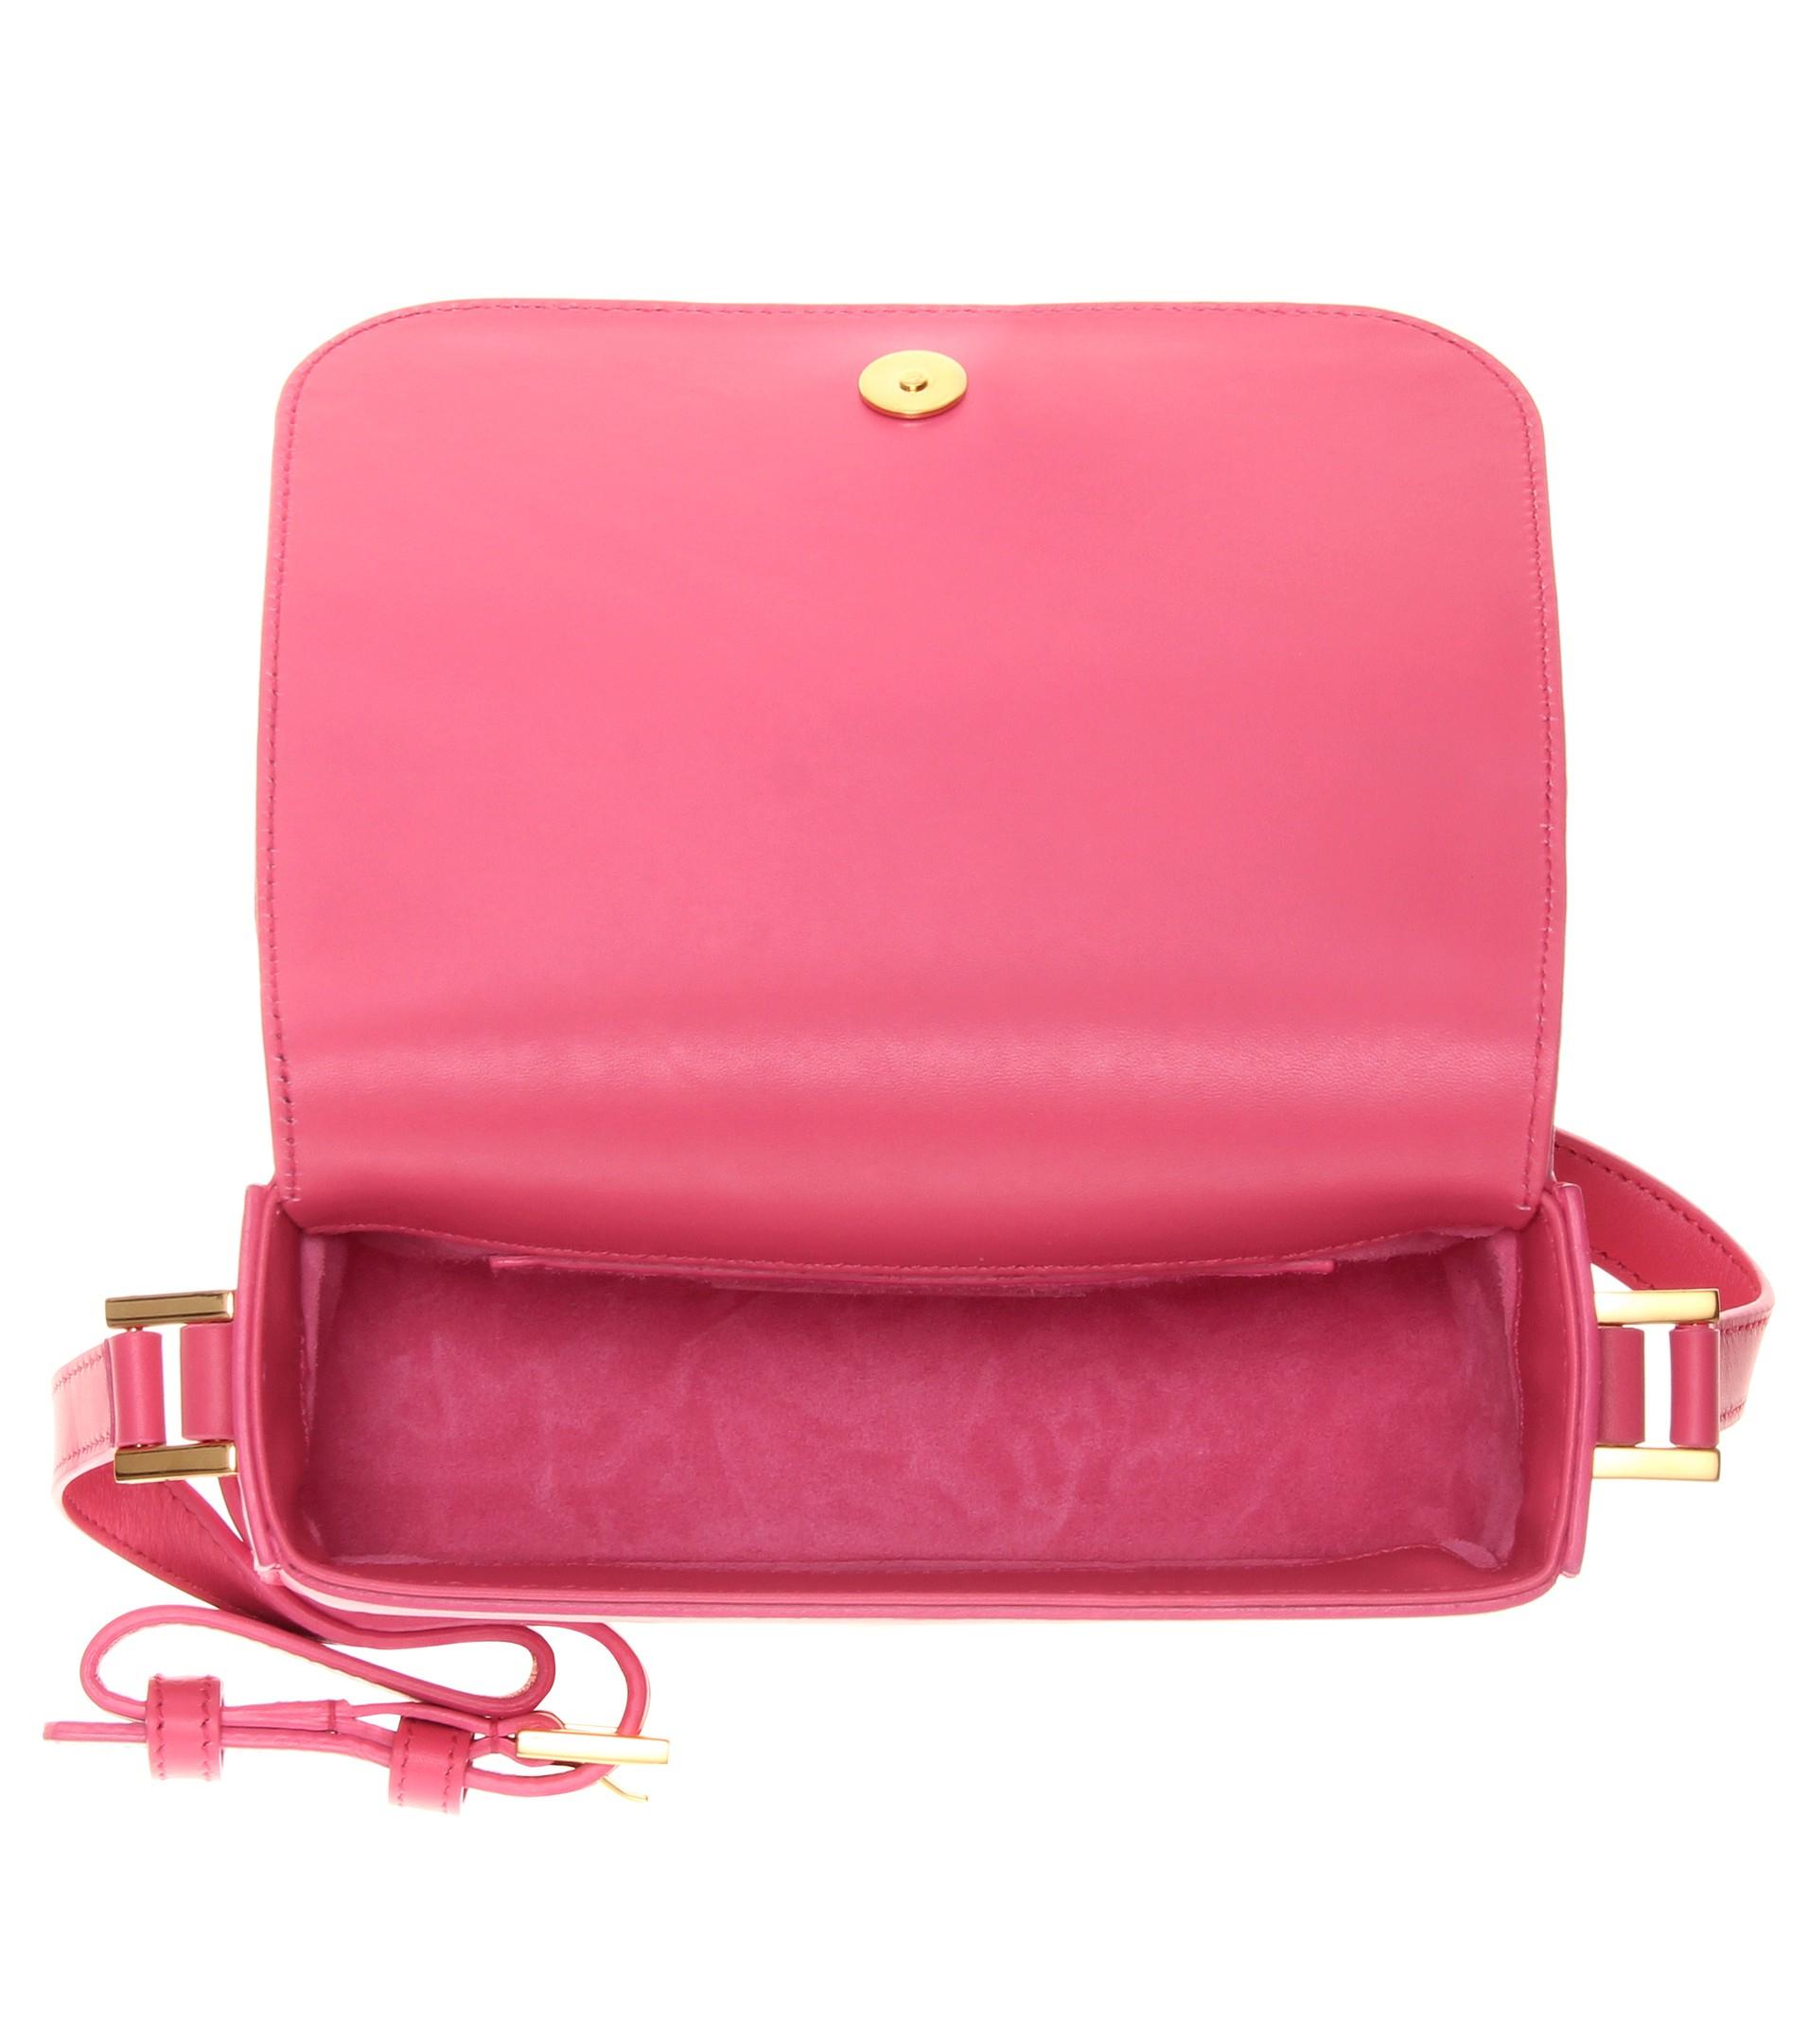 ysl chyc shoulder bag price - monogram small universite satchel bag, black